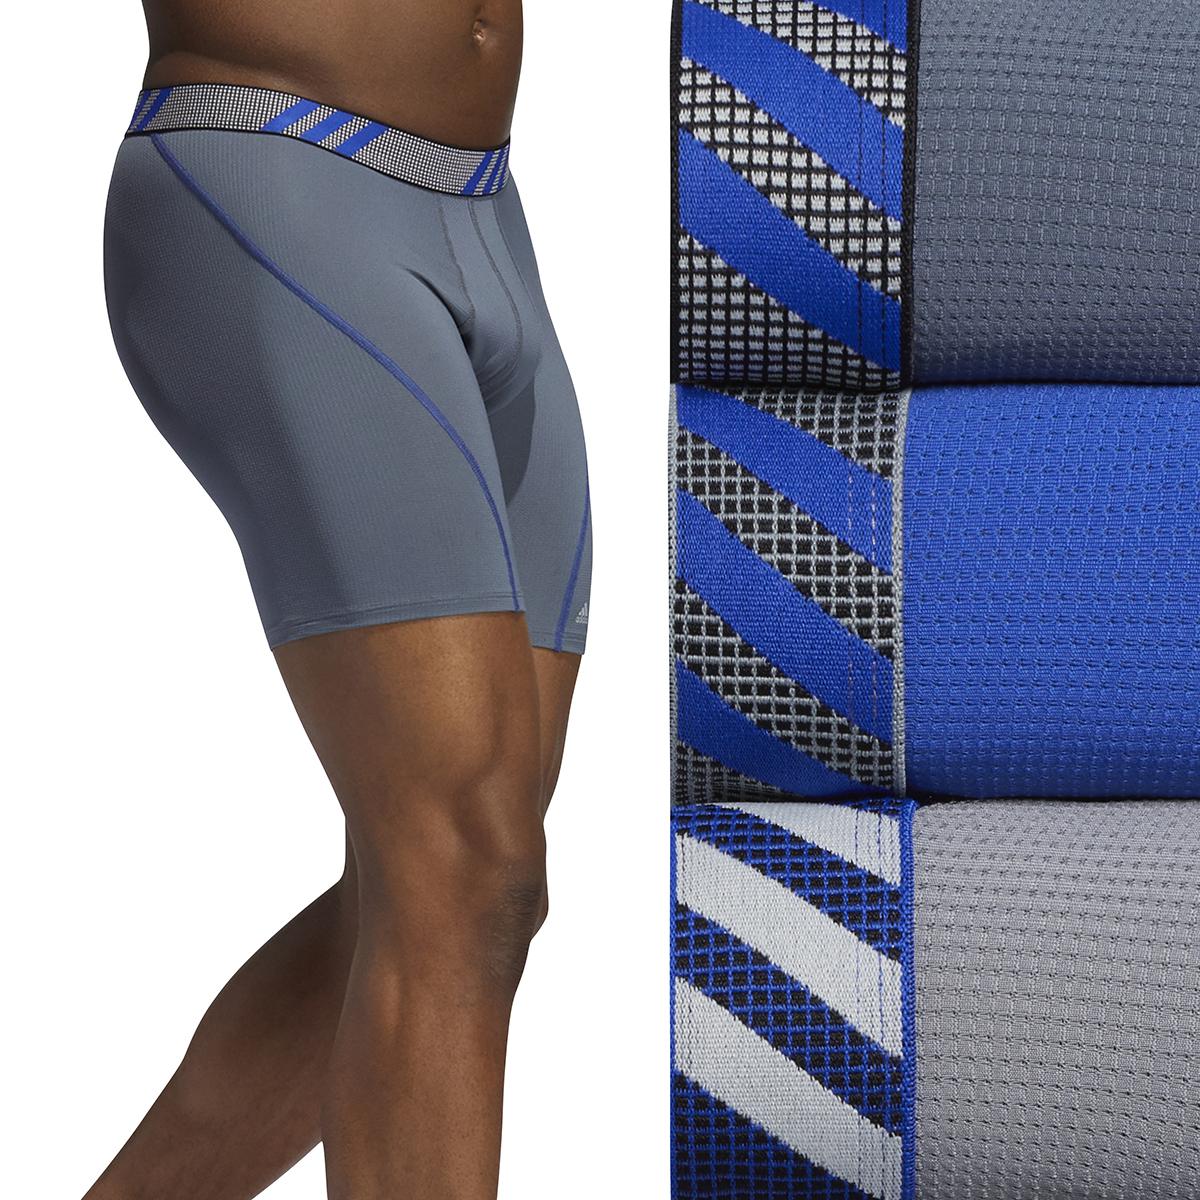 Men's Adidas Performance Mesh 3 Pack Boxer Briefs - Color: Onix Grey/Blue - Size: S, Onix Grey/Blue, large, image 3